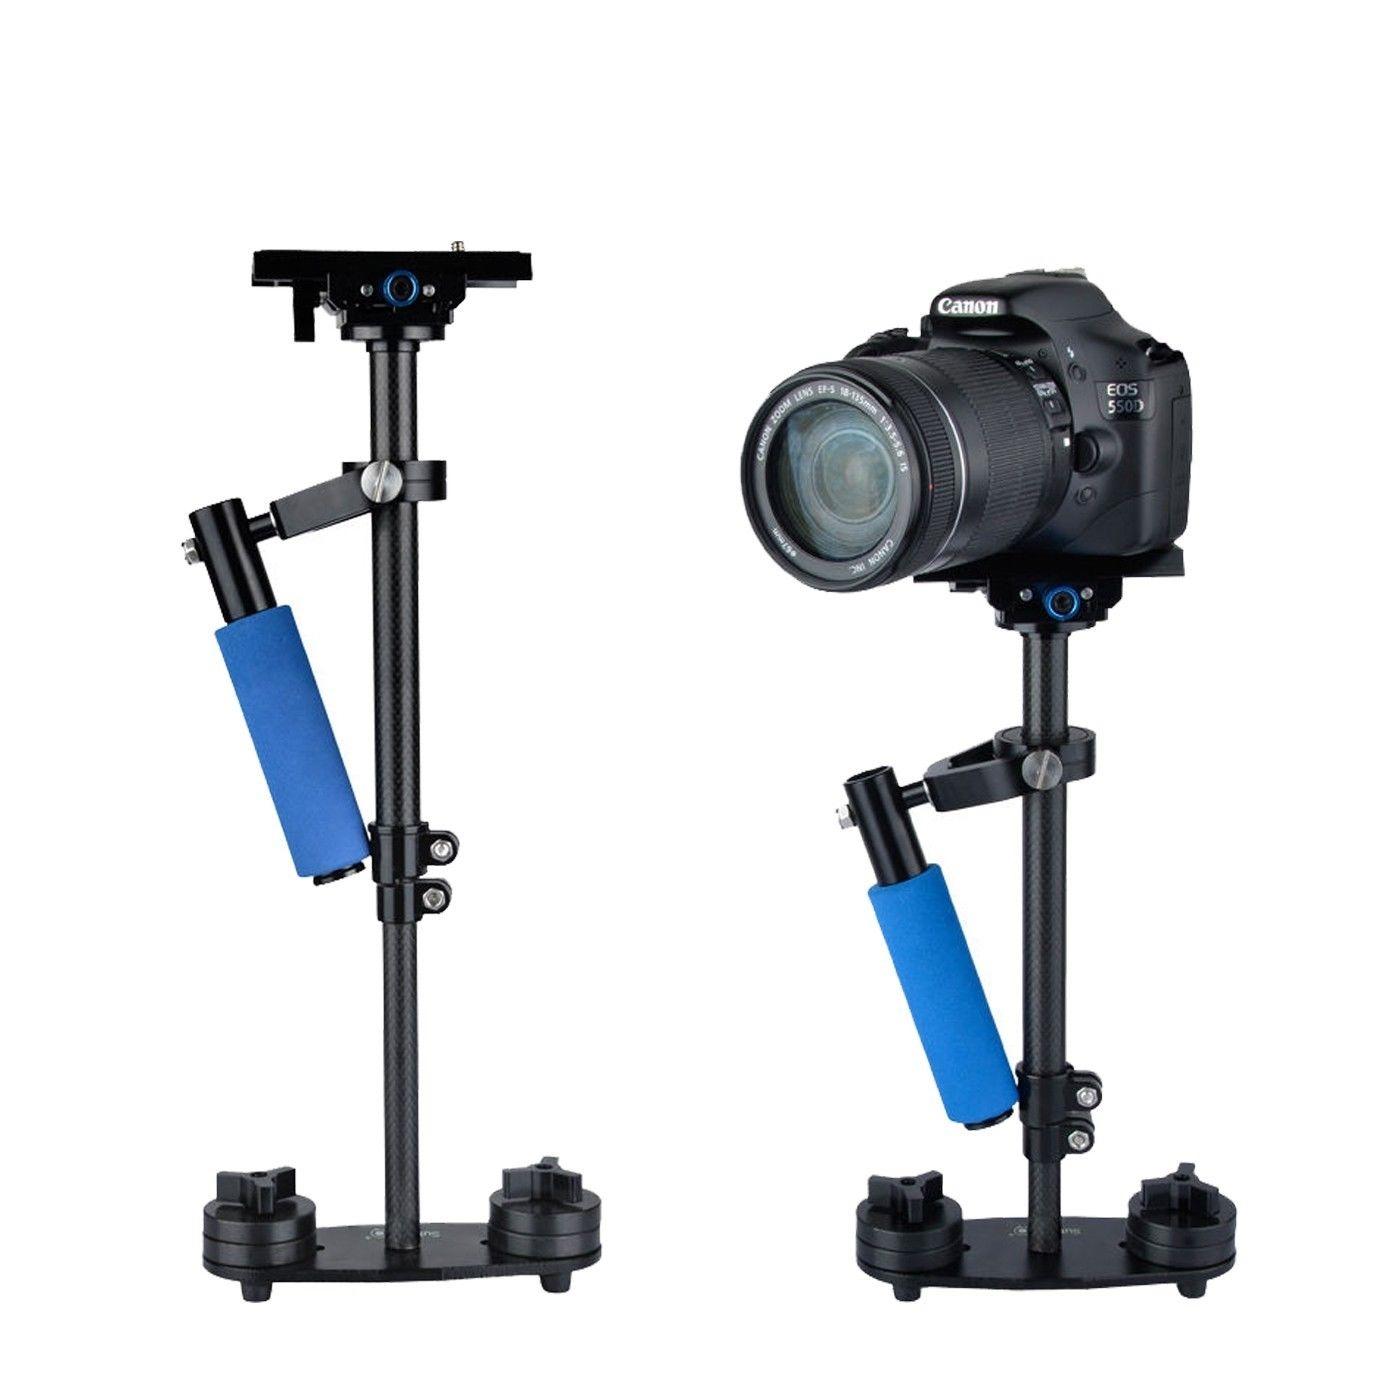 76.45$  Buy here - http://alid28.worldwells.pw/go.php?t=32558910873 - SF-04 S40 2.4Kg Carbon Fiber Handheld Stabilizer for Steadicam DLSR Camera Camcorder